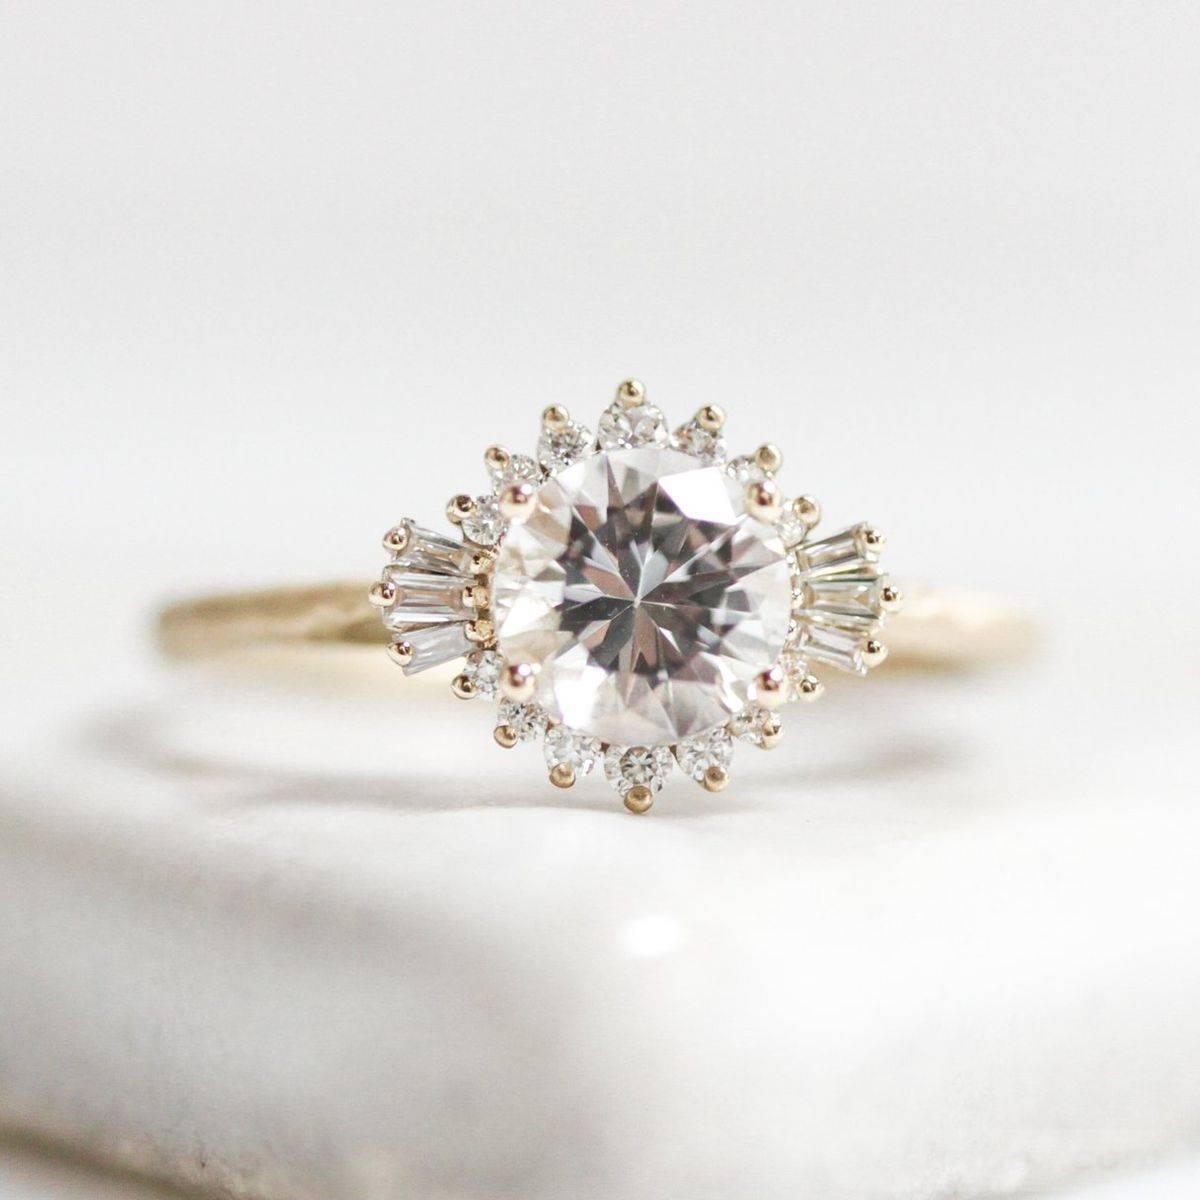 Art deco engagement ring-173599760623378322